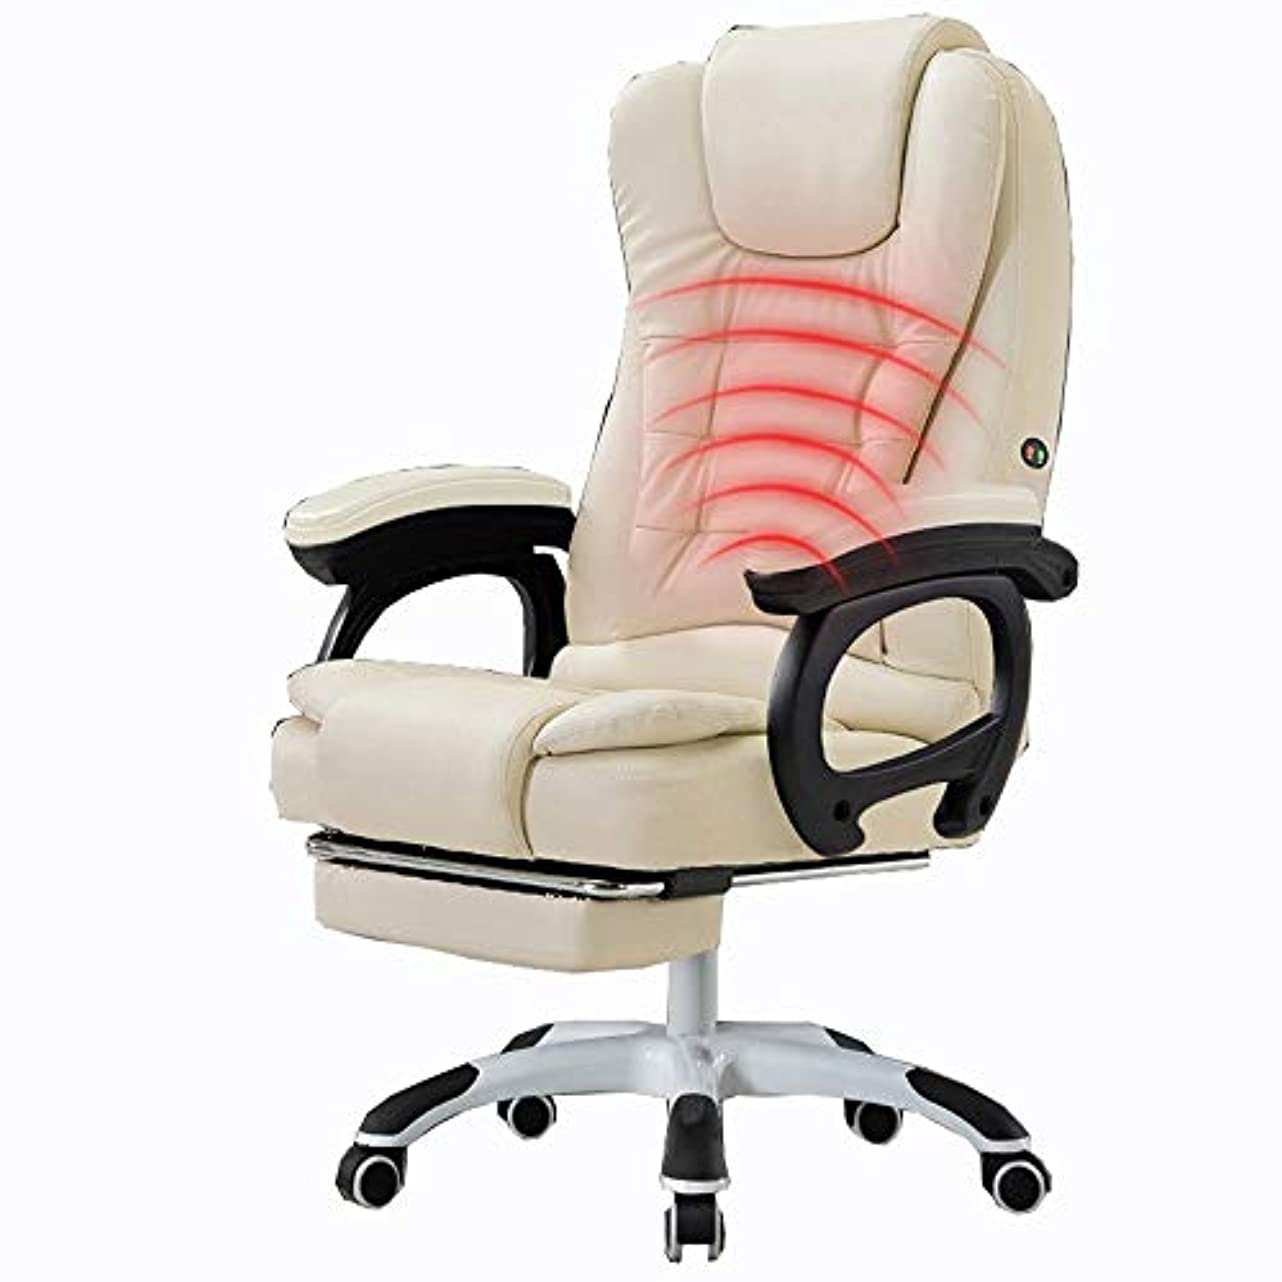 LJFYXZ 社長椅子 約160度リクライニング フットレスト 高さ昇降 肉厚クッション ウエストマッサージ レザー ビジネス デスクチェア ベアリング重量150kg (Color : Beige)